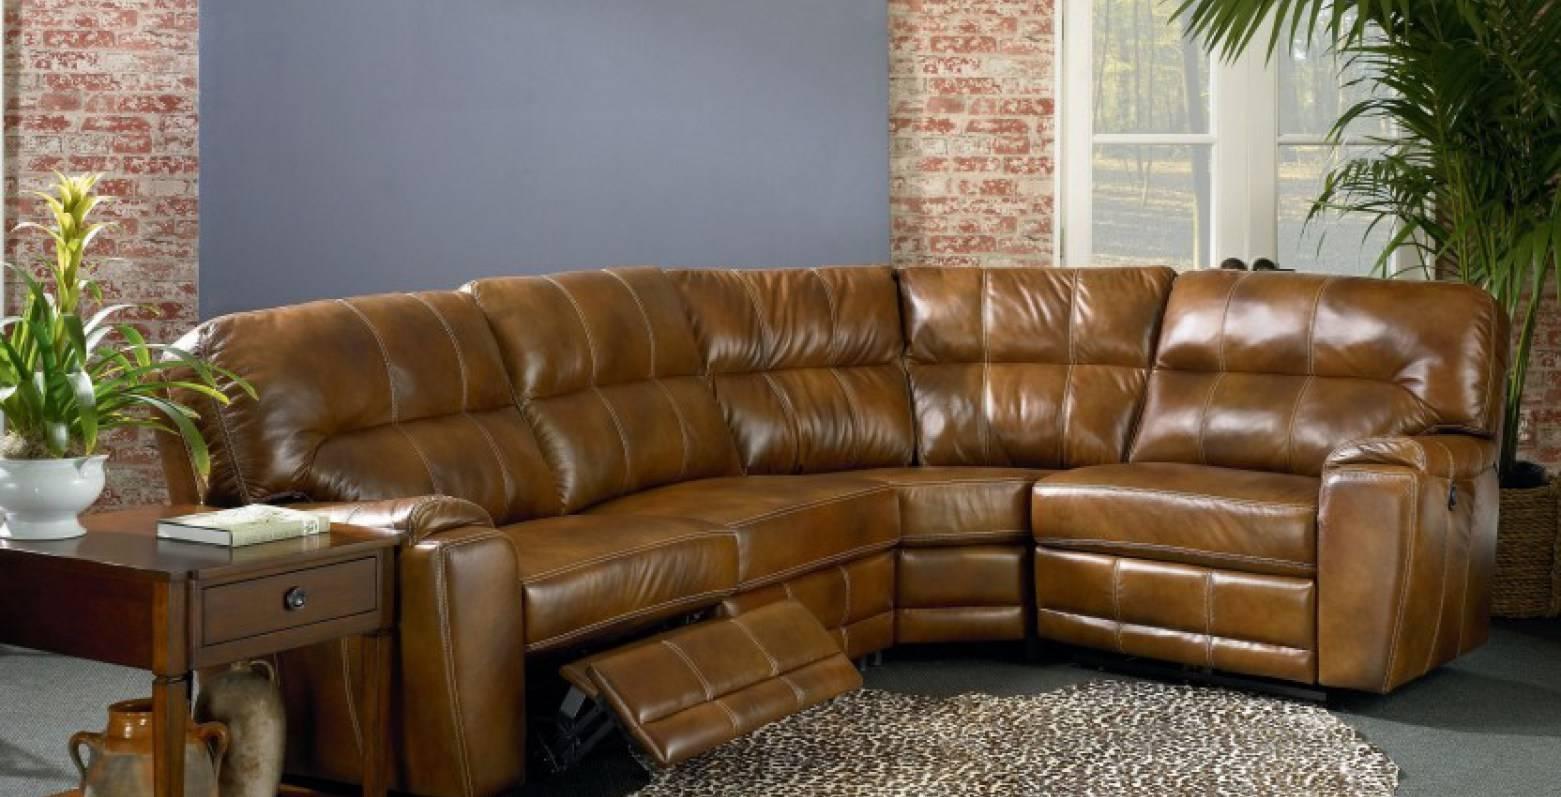 Enthrall Photo Quality Corner Sofa Bed Sensational Single Sofa Bed with Denver Sleeper Sofas (Image 4 of 15)